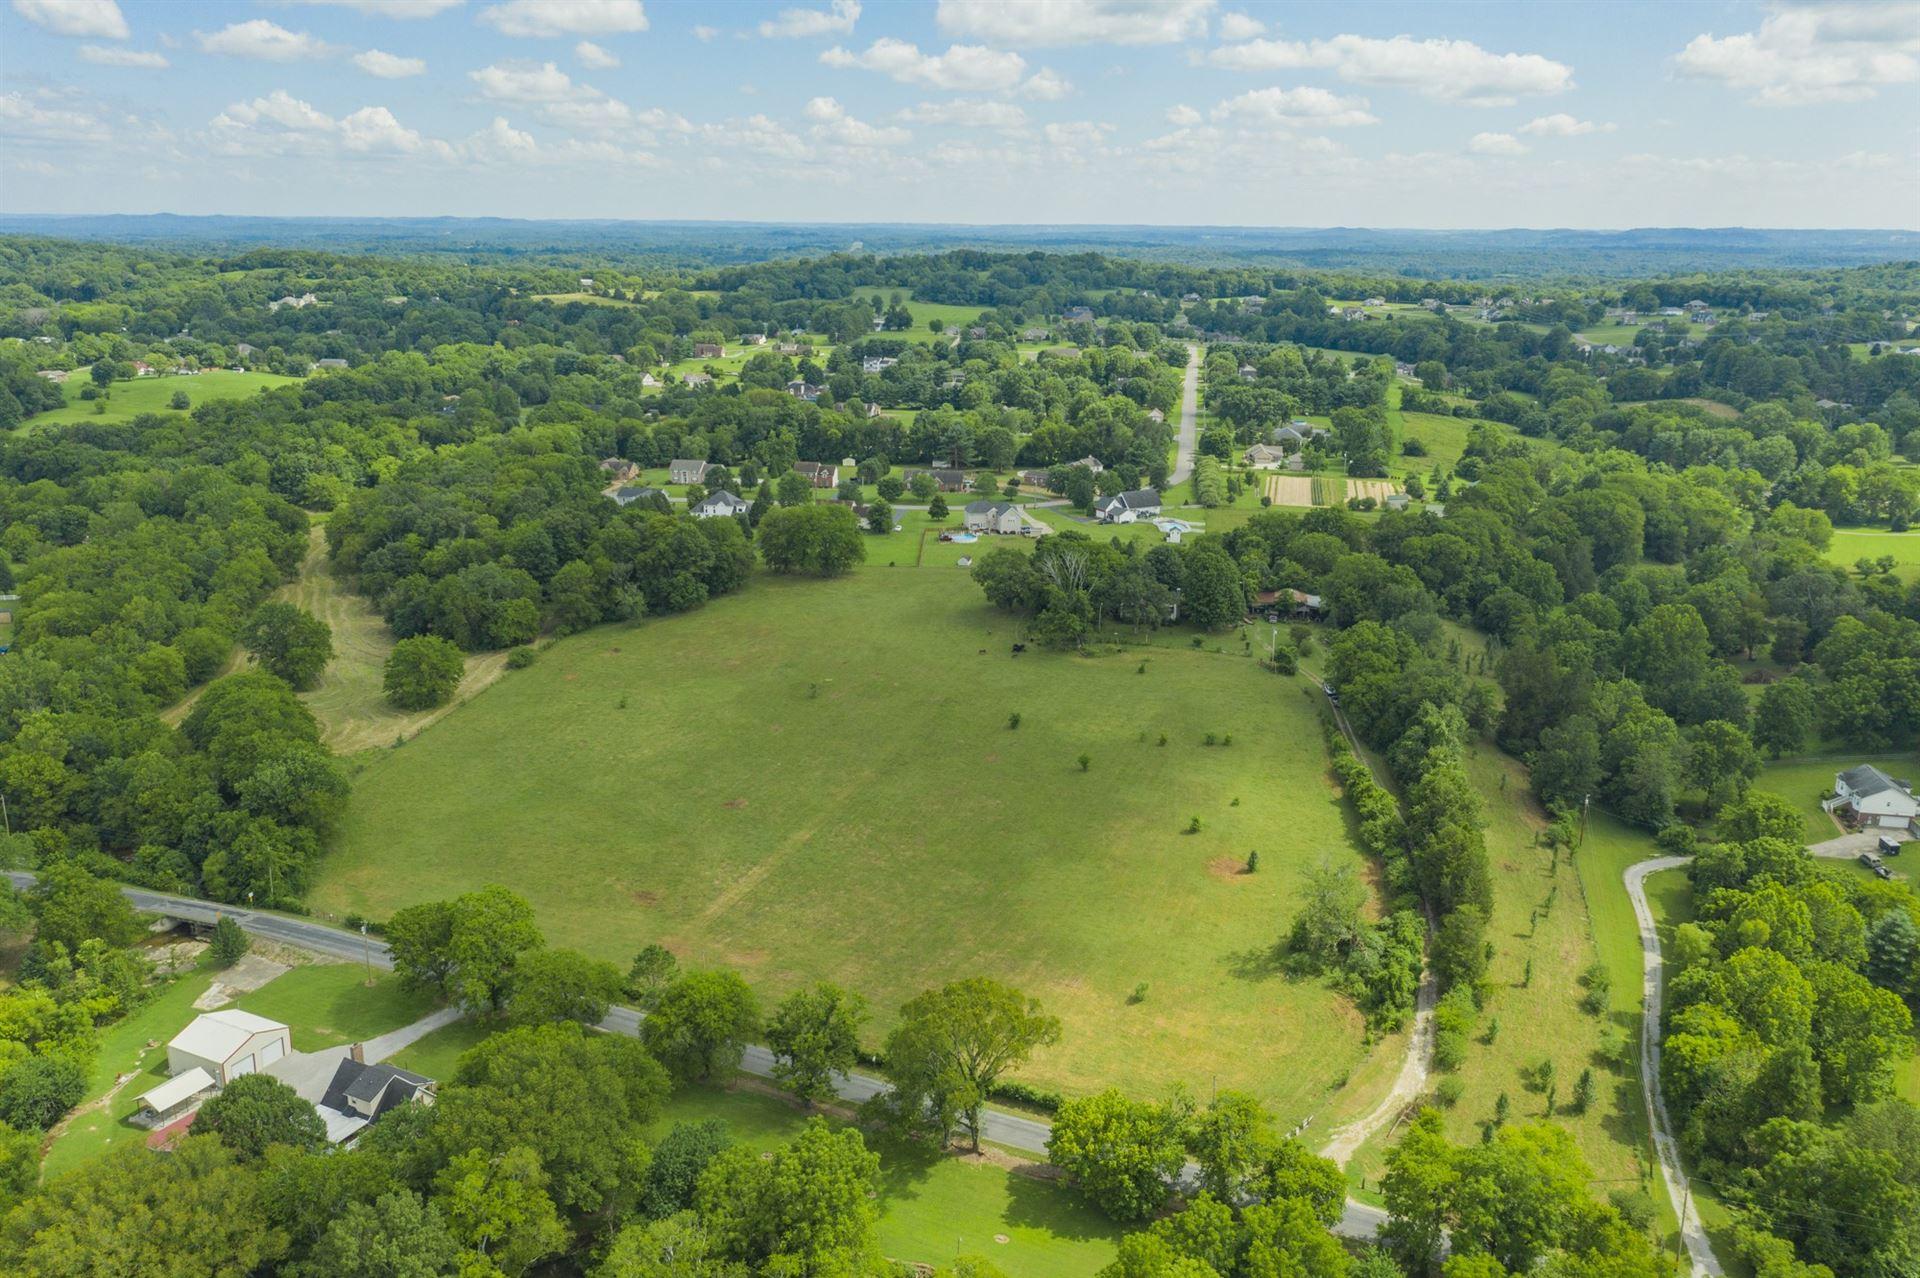 840 Cranford Hollow Rd, Columbia, TN 38401 - MLS#: 2102188